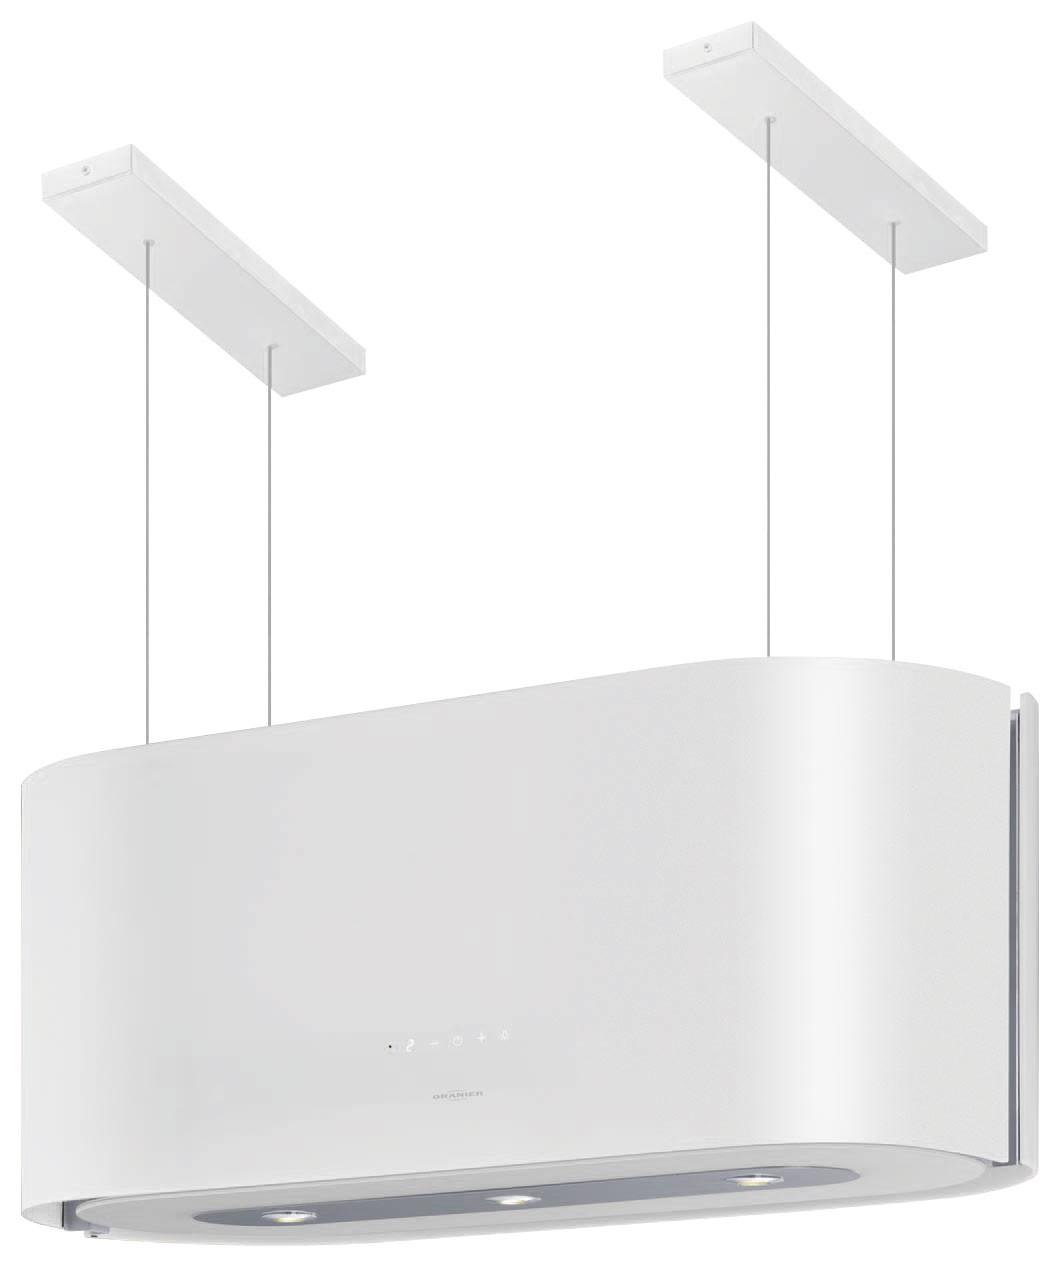 oranier dunstabzugshauben inselhaube santina isola 80 w. Black Bedroom Furniture Sets. Home Design Ideas